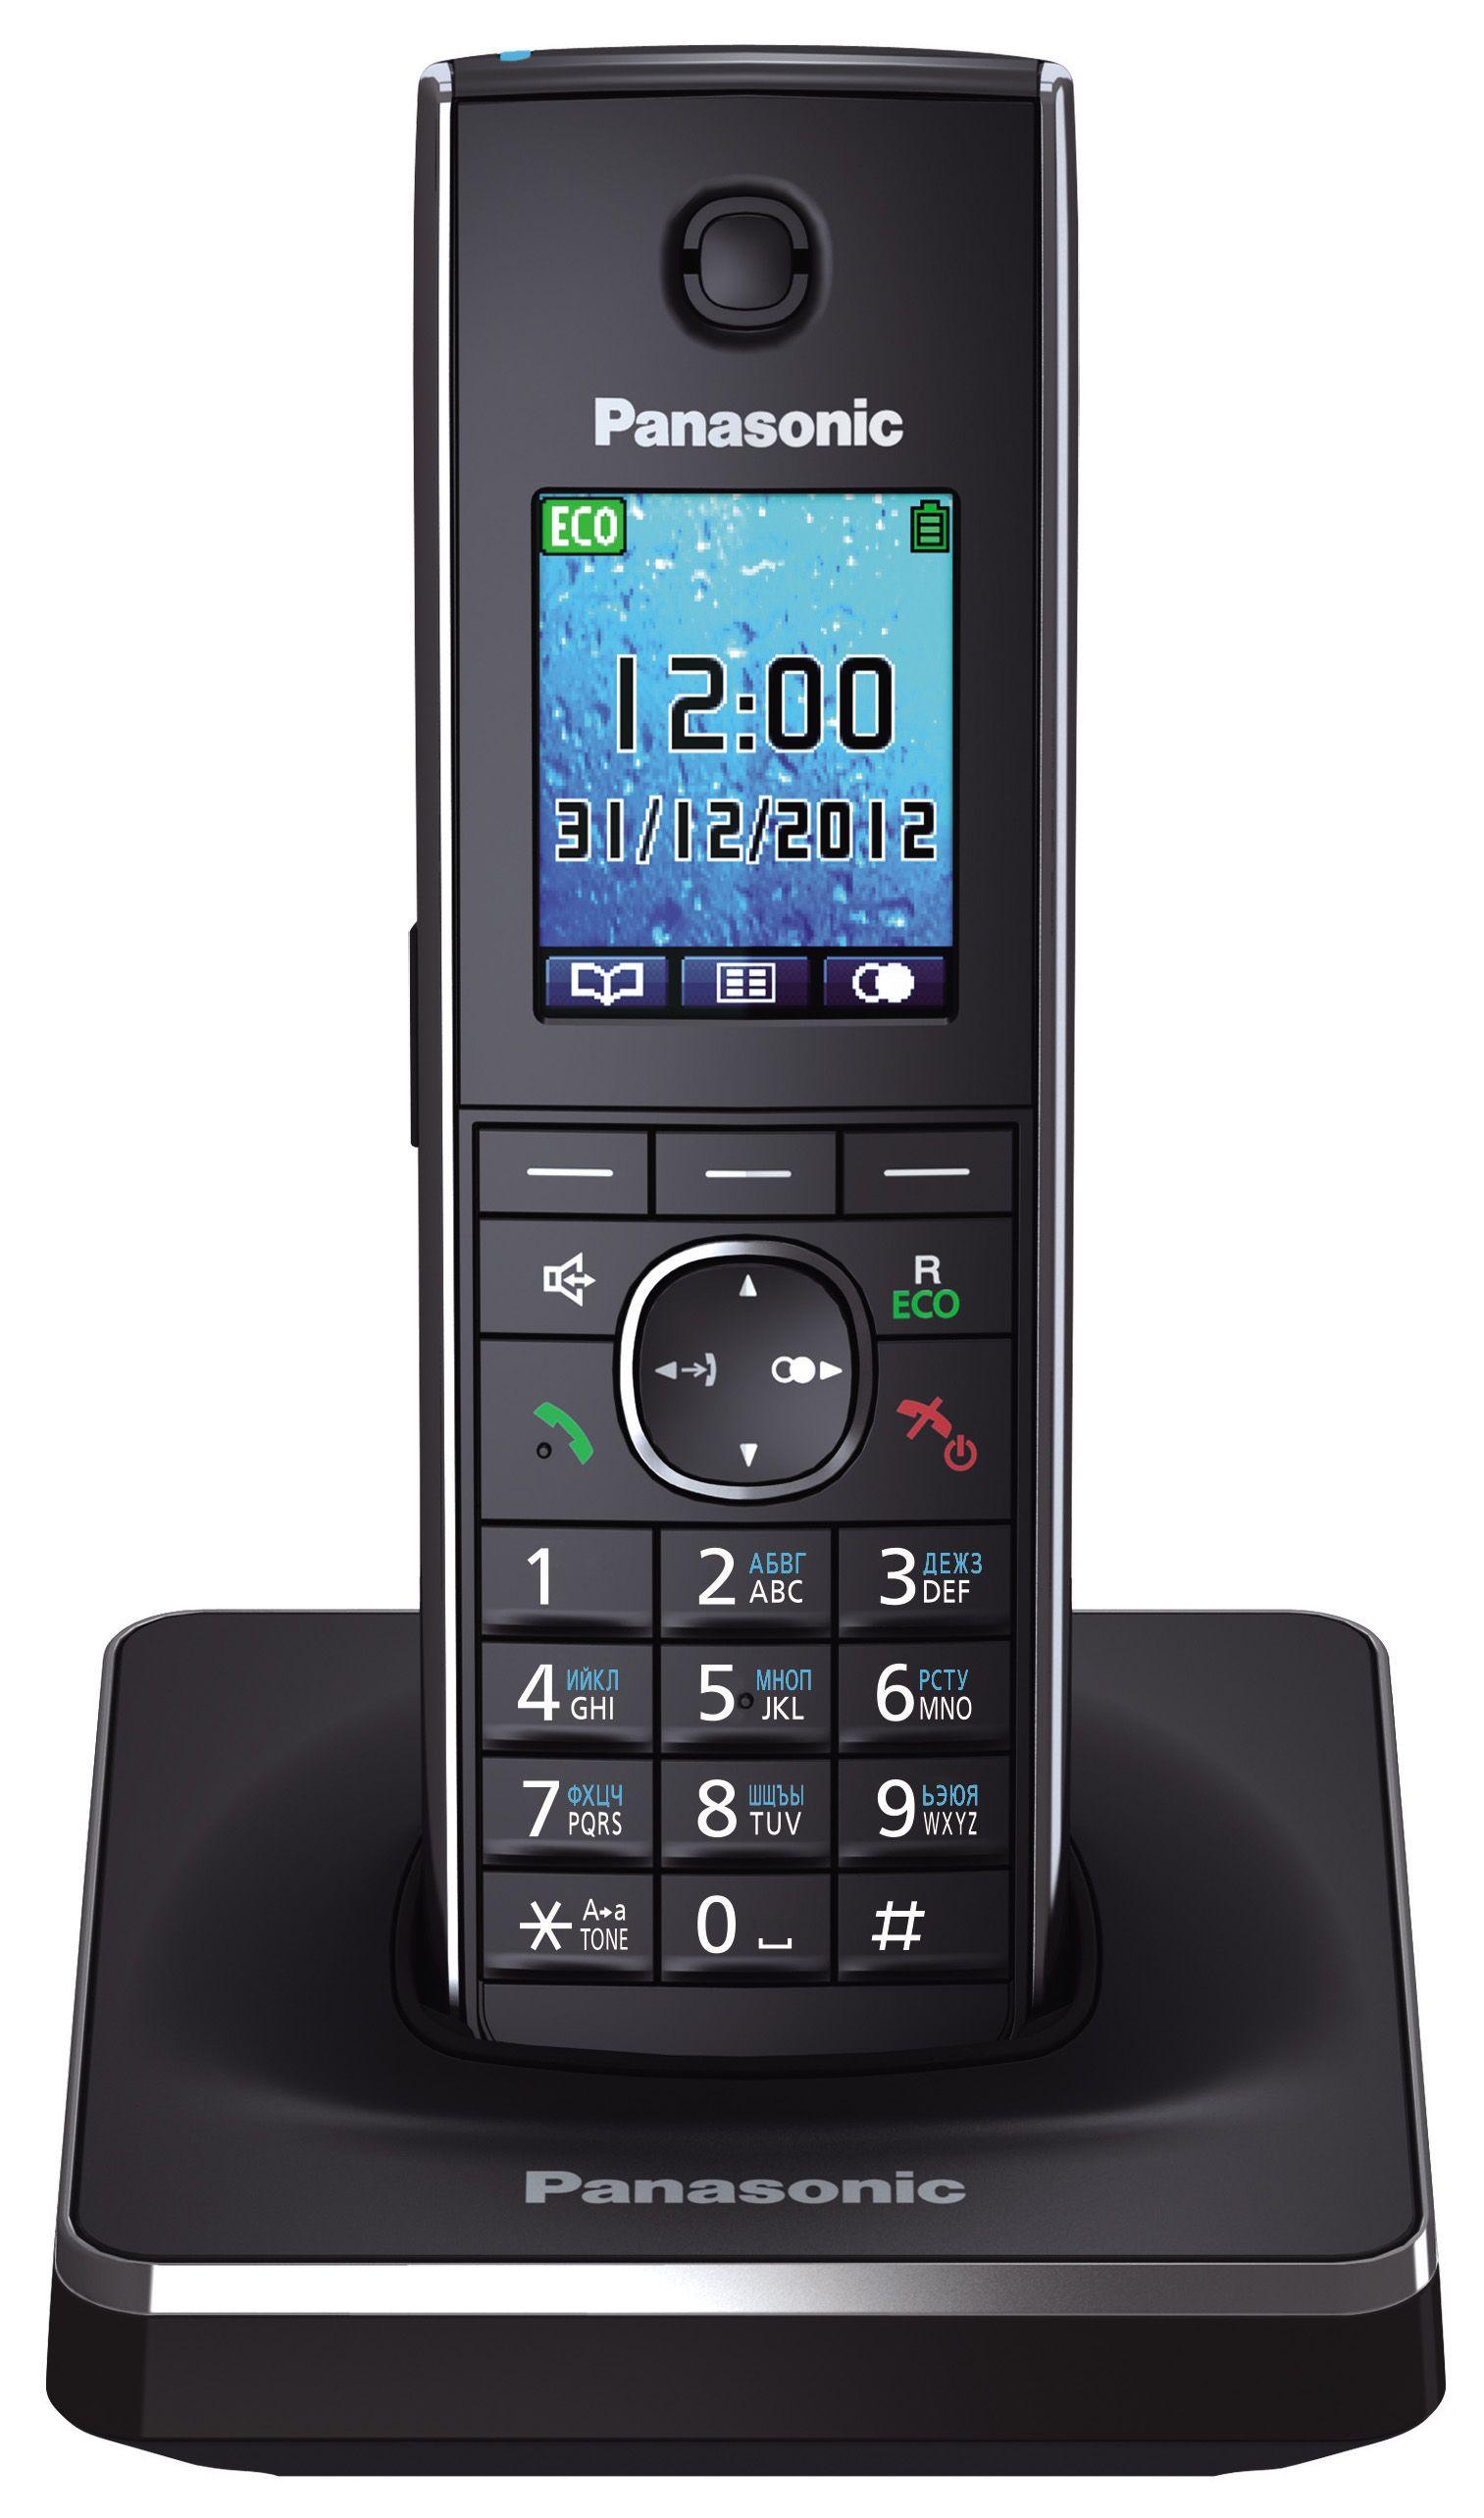 Телефон DECT Panasonic KX-TG8551RUB (черный)DECT телефоны<br><br><br>Артикул: KX-TG8551RUB<br>Бренд: Panasonic<br>Высота упаковки (мм): 145<br>Длина упаковки (мм): 190<br>Ширина упаковки (мм): 110<br>Вес упаковки (кг): 2